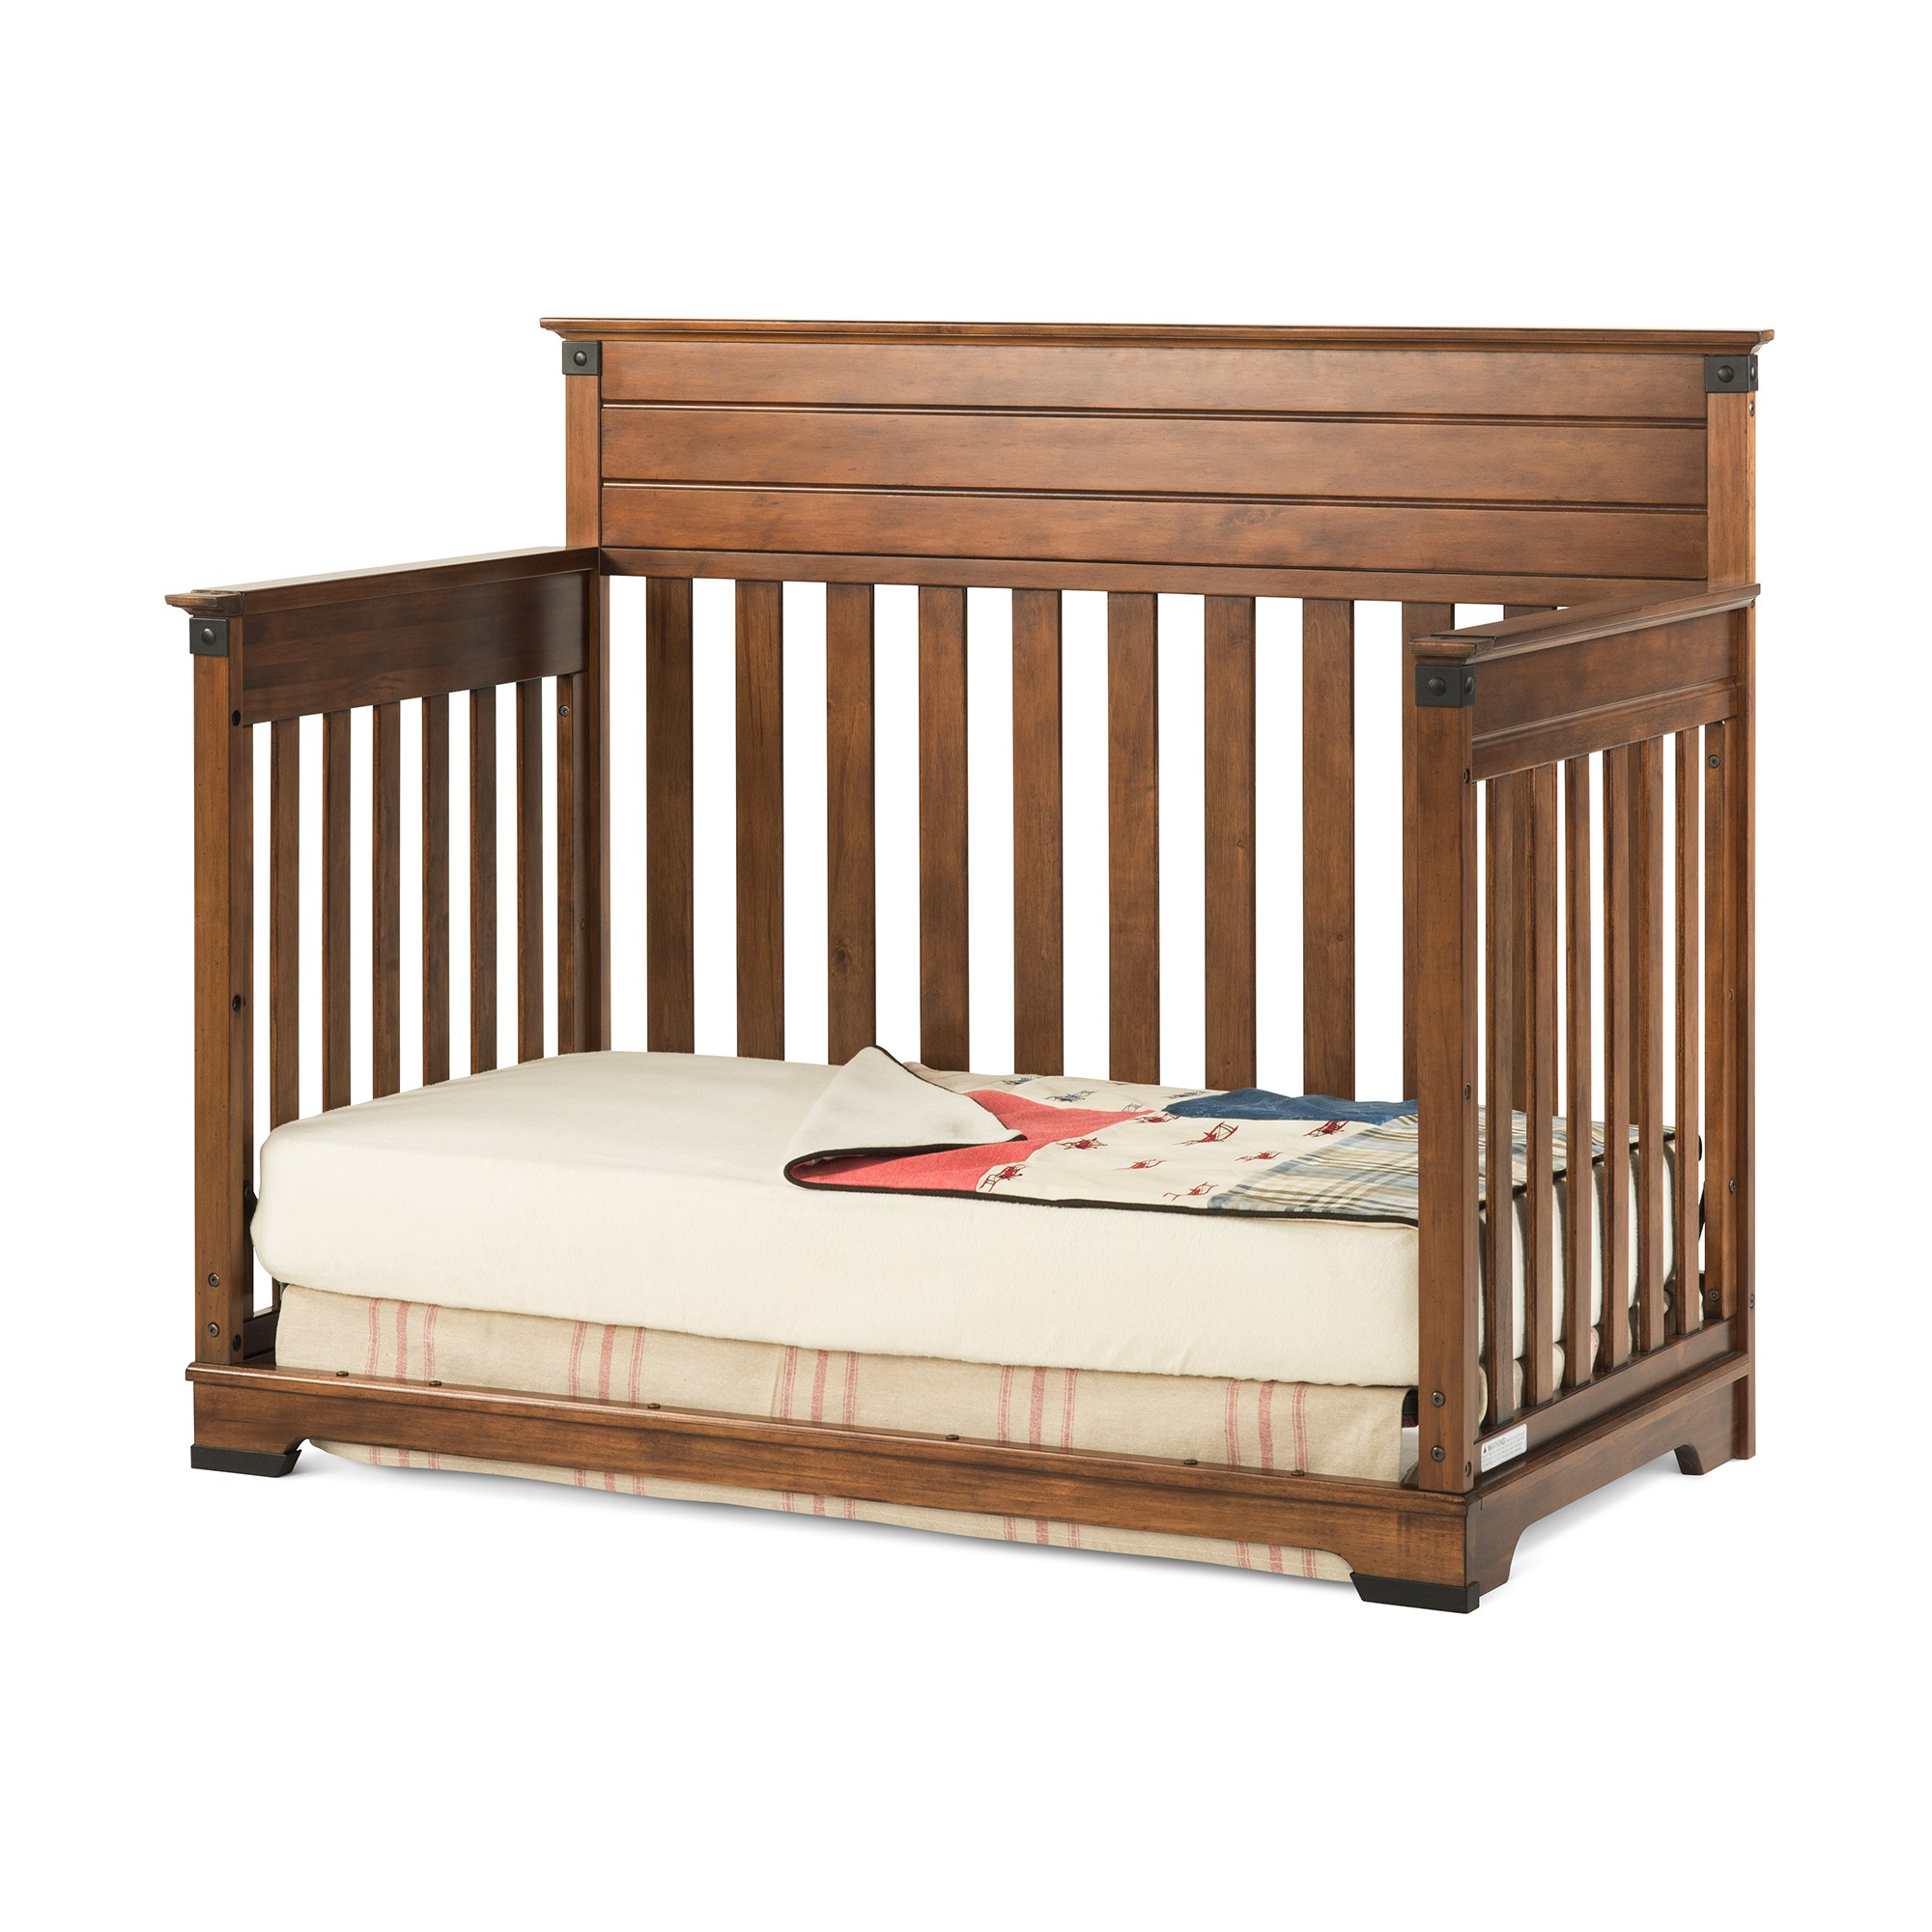 redmond 4 in 1 convertible crib child craft rh childcraftbaby com Cherry Espresso Delta Crib Manual Baby Crib Instruction Manual